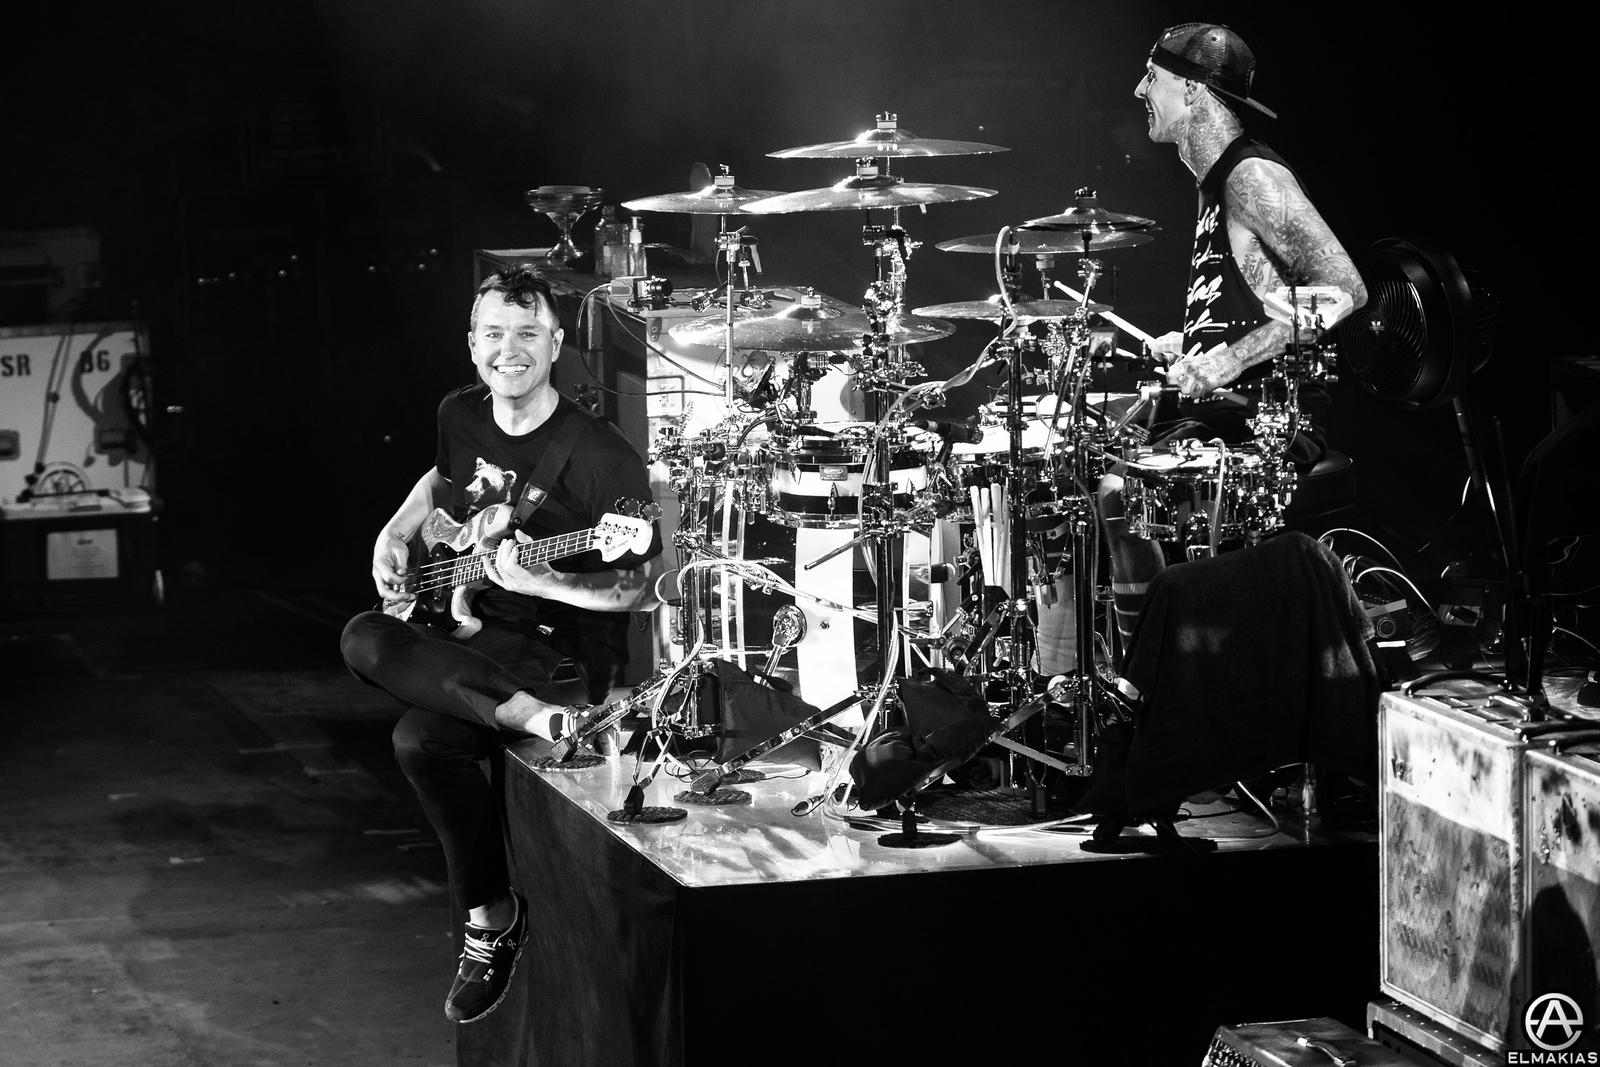 Mark Hoppus and Travis Barker of Blink-182 at Leeds Festival